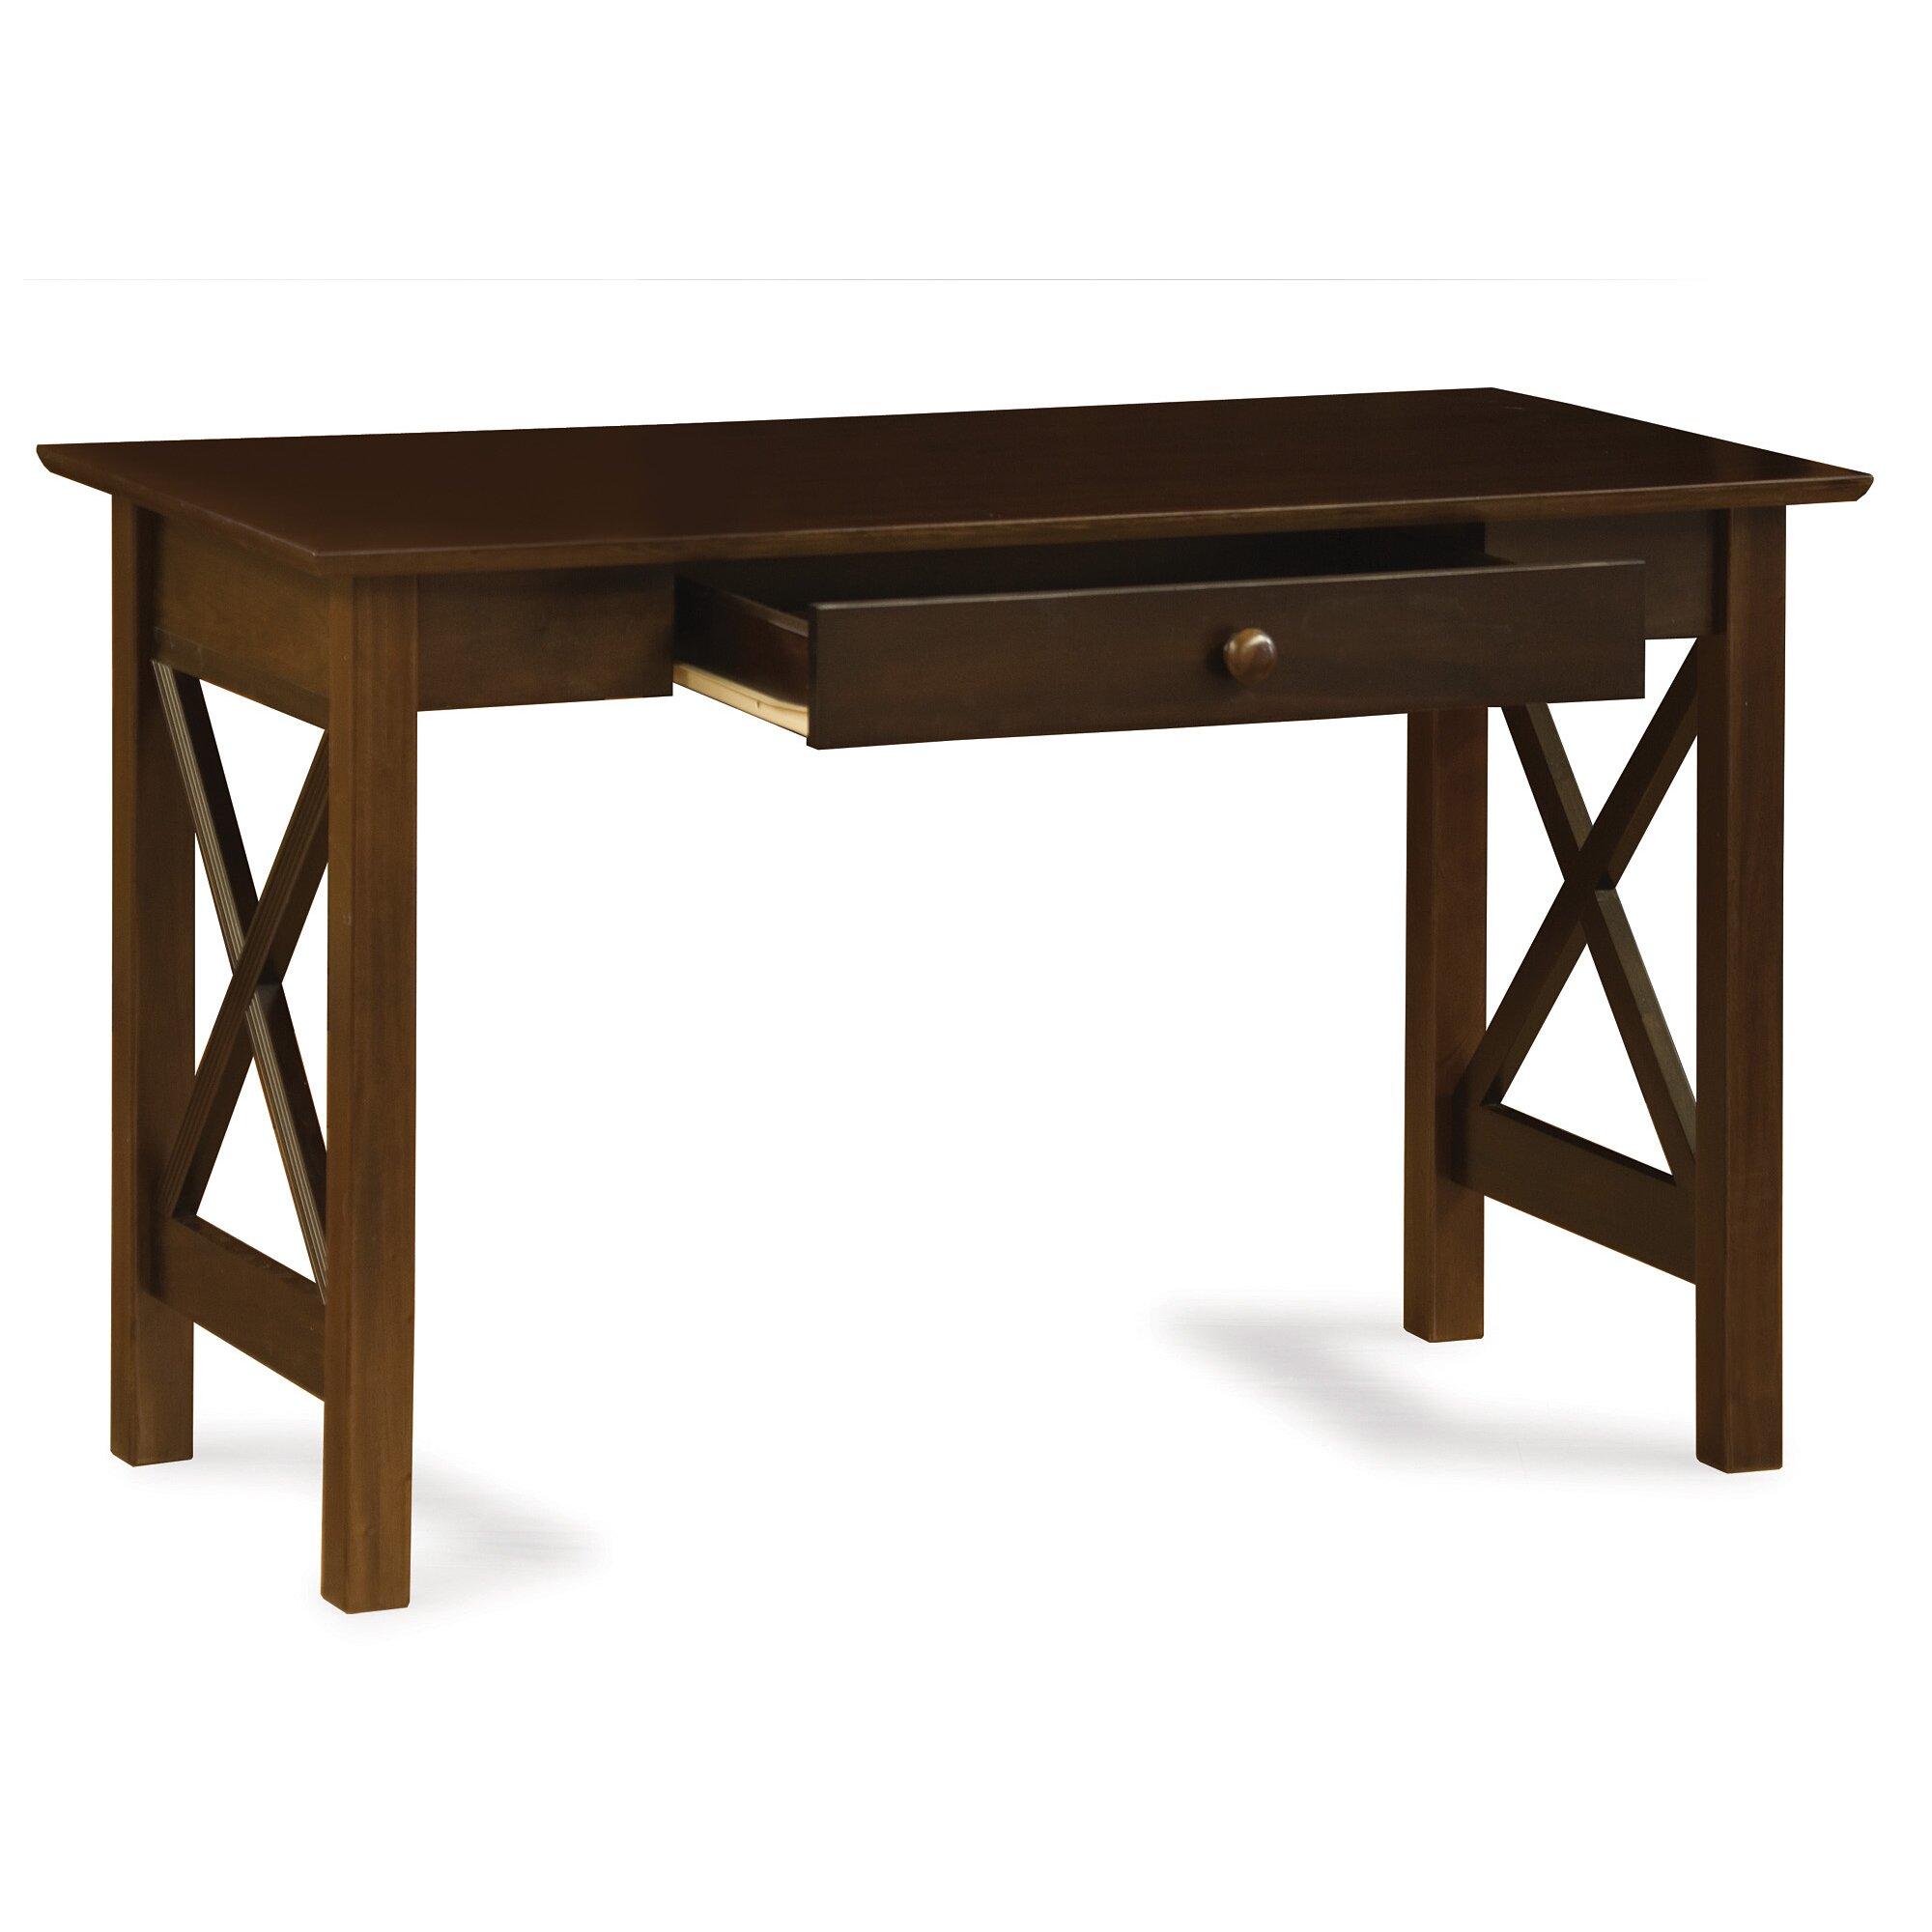 Atlantic furniture lexi writing desk reviews wayfair Wayfair furniture